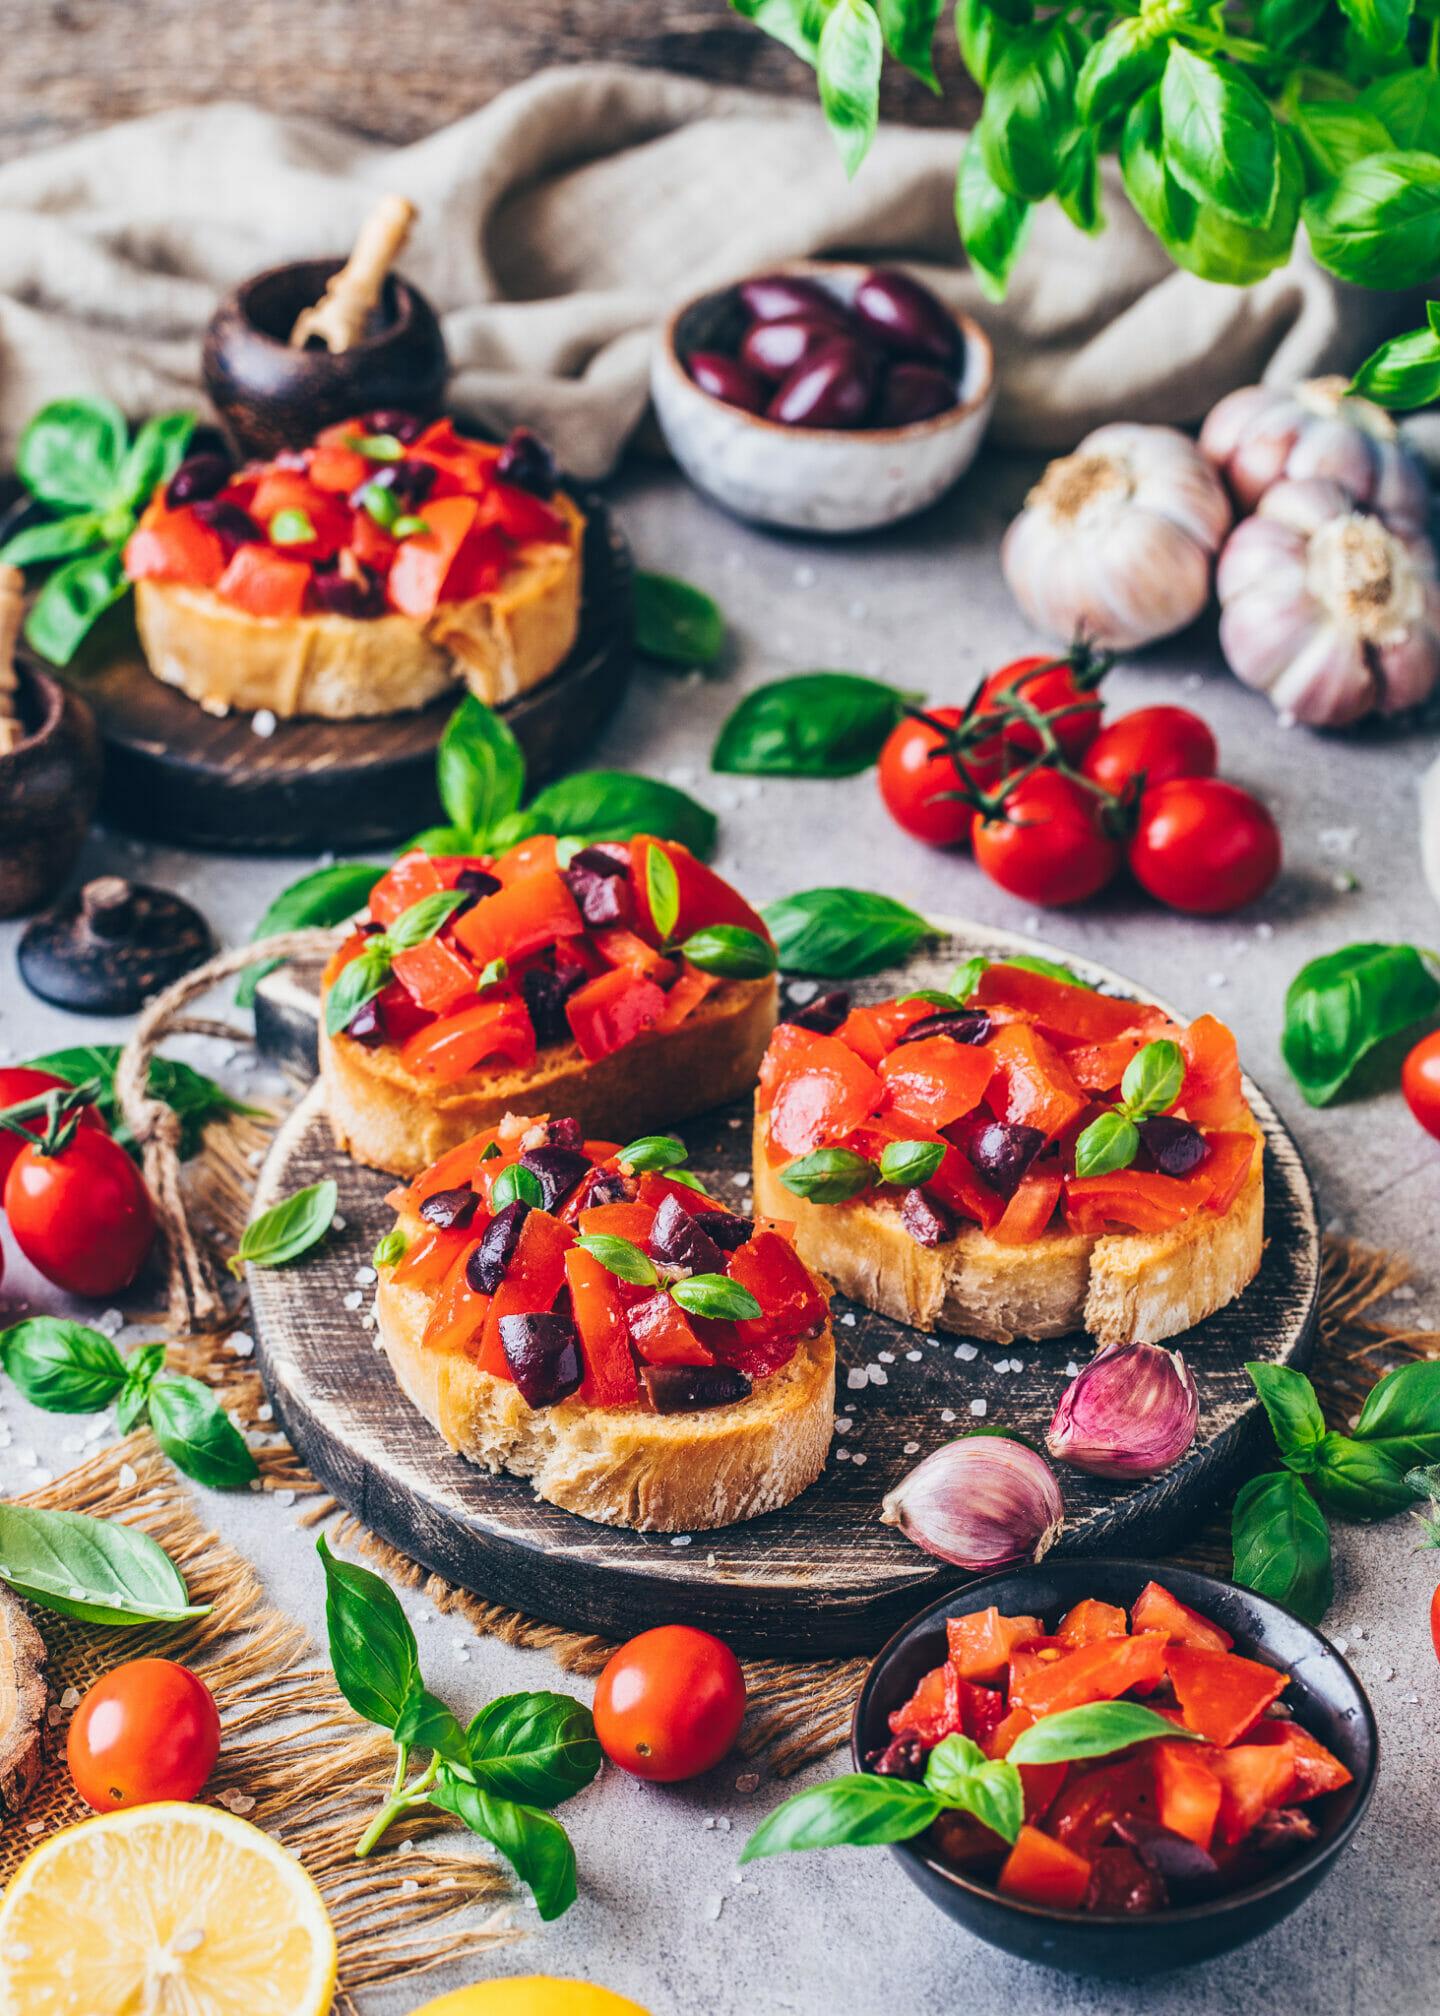 Tomaten-Knoblauch-Bruschetta mit Basilikum